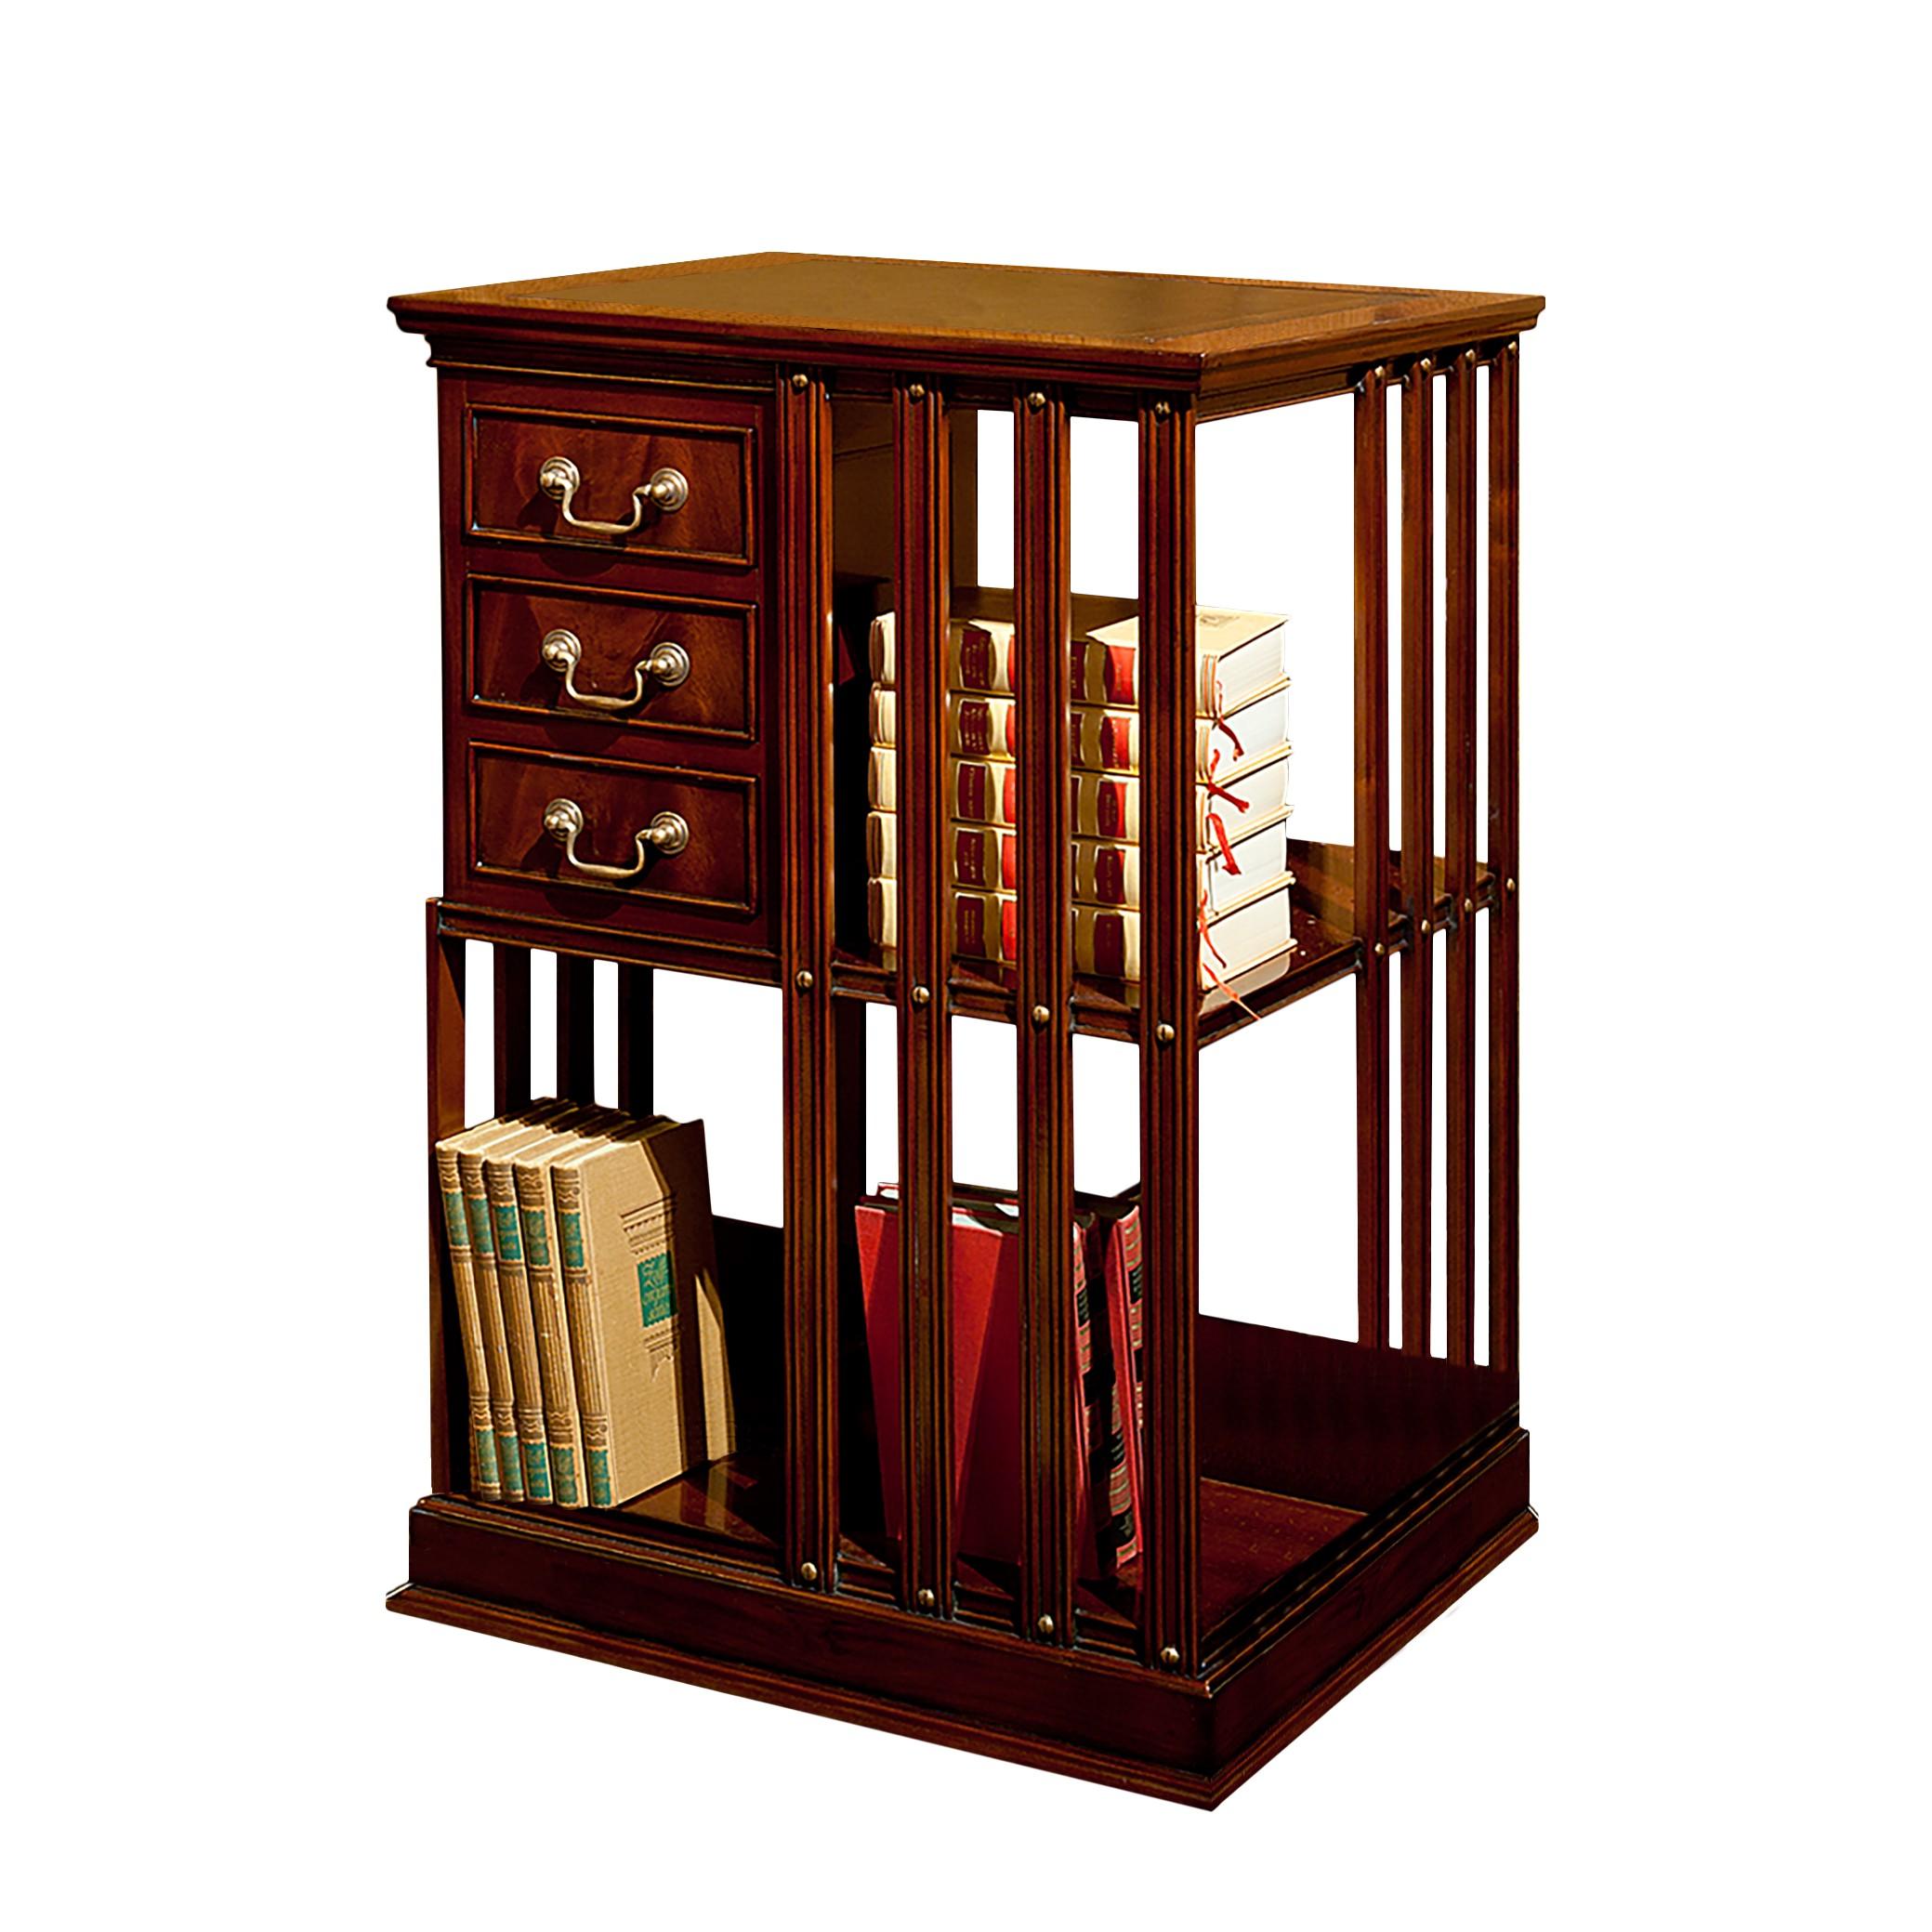 b cherregal mahagoni g nstig kaufen. Black Bedroom Furniture Sets. Home Design Ideas